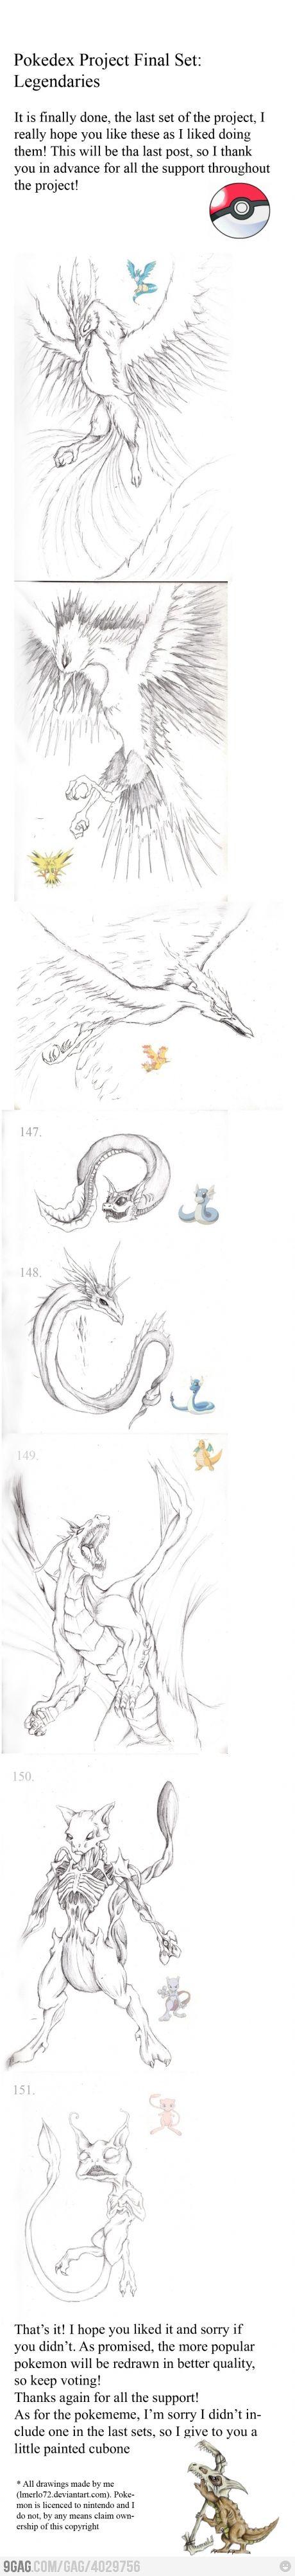 Pokemon Reimagined : Legendaries